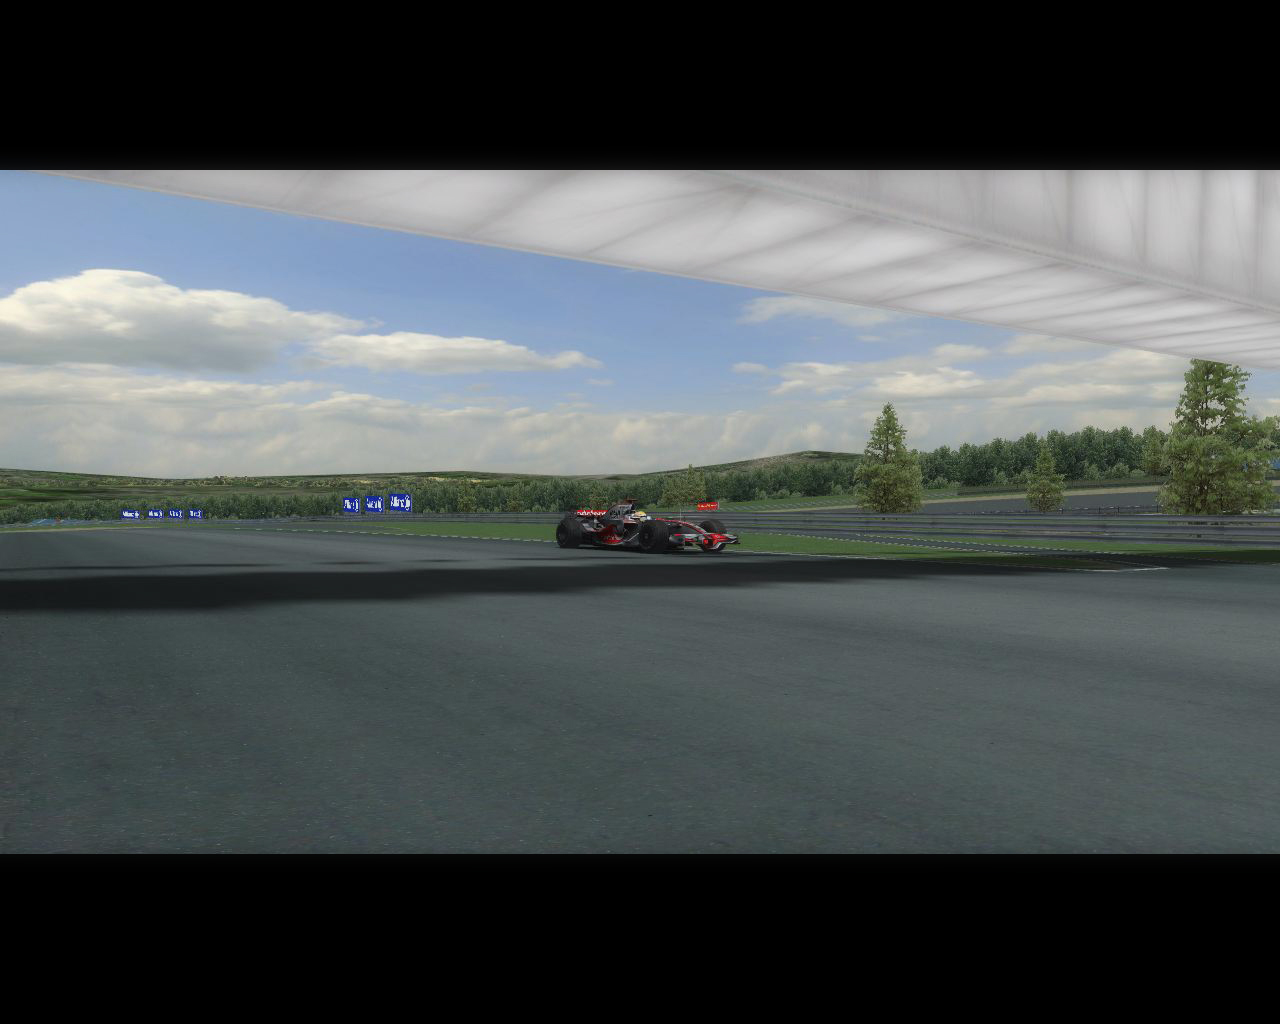 Culmone67 FSONE 2008 Trackpack – Released – VirtualR net – 100